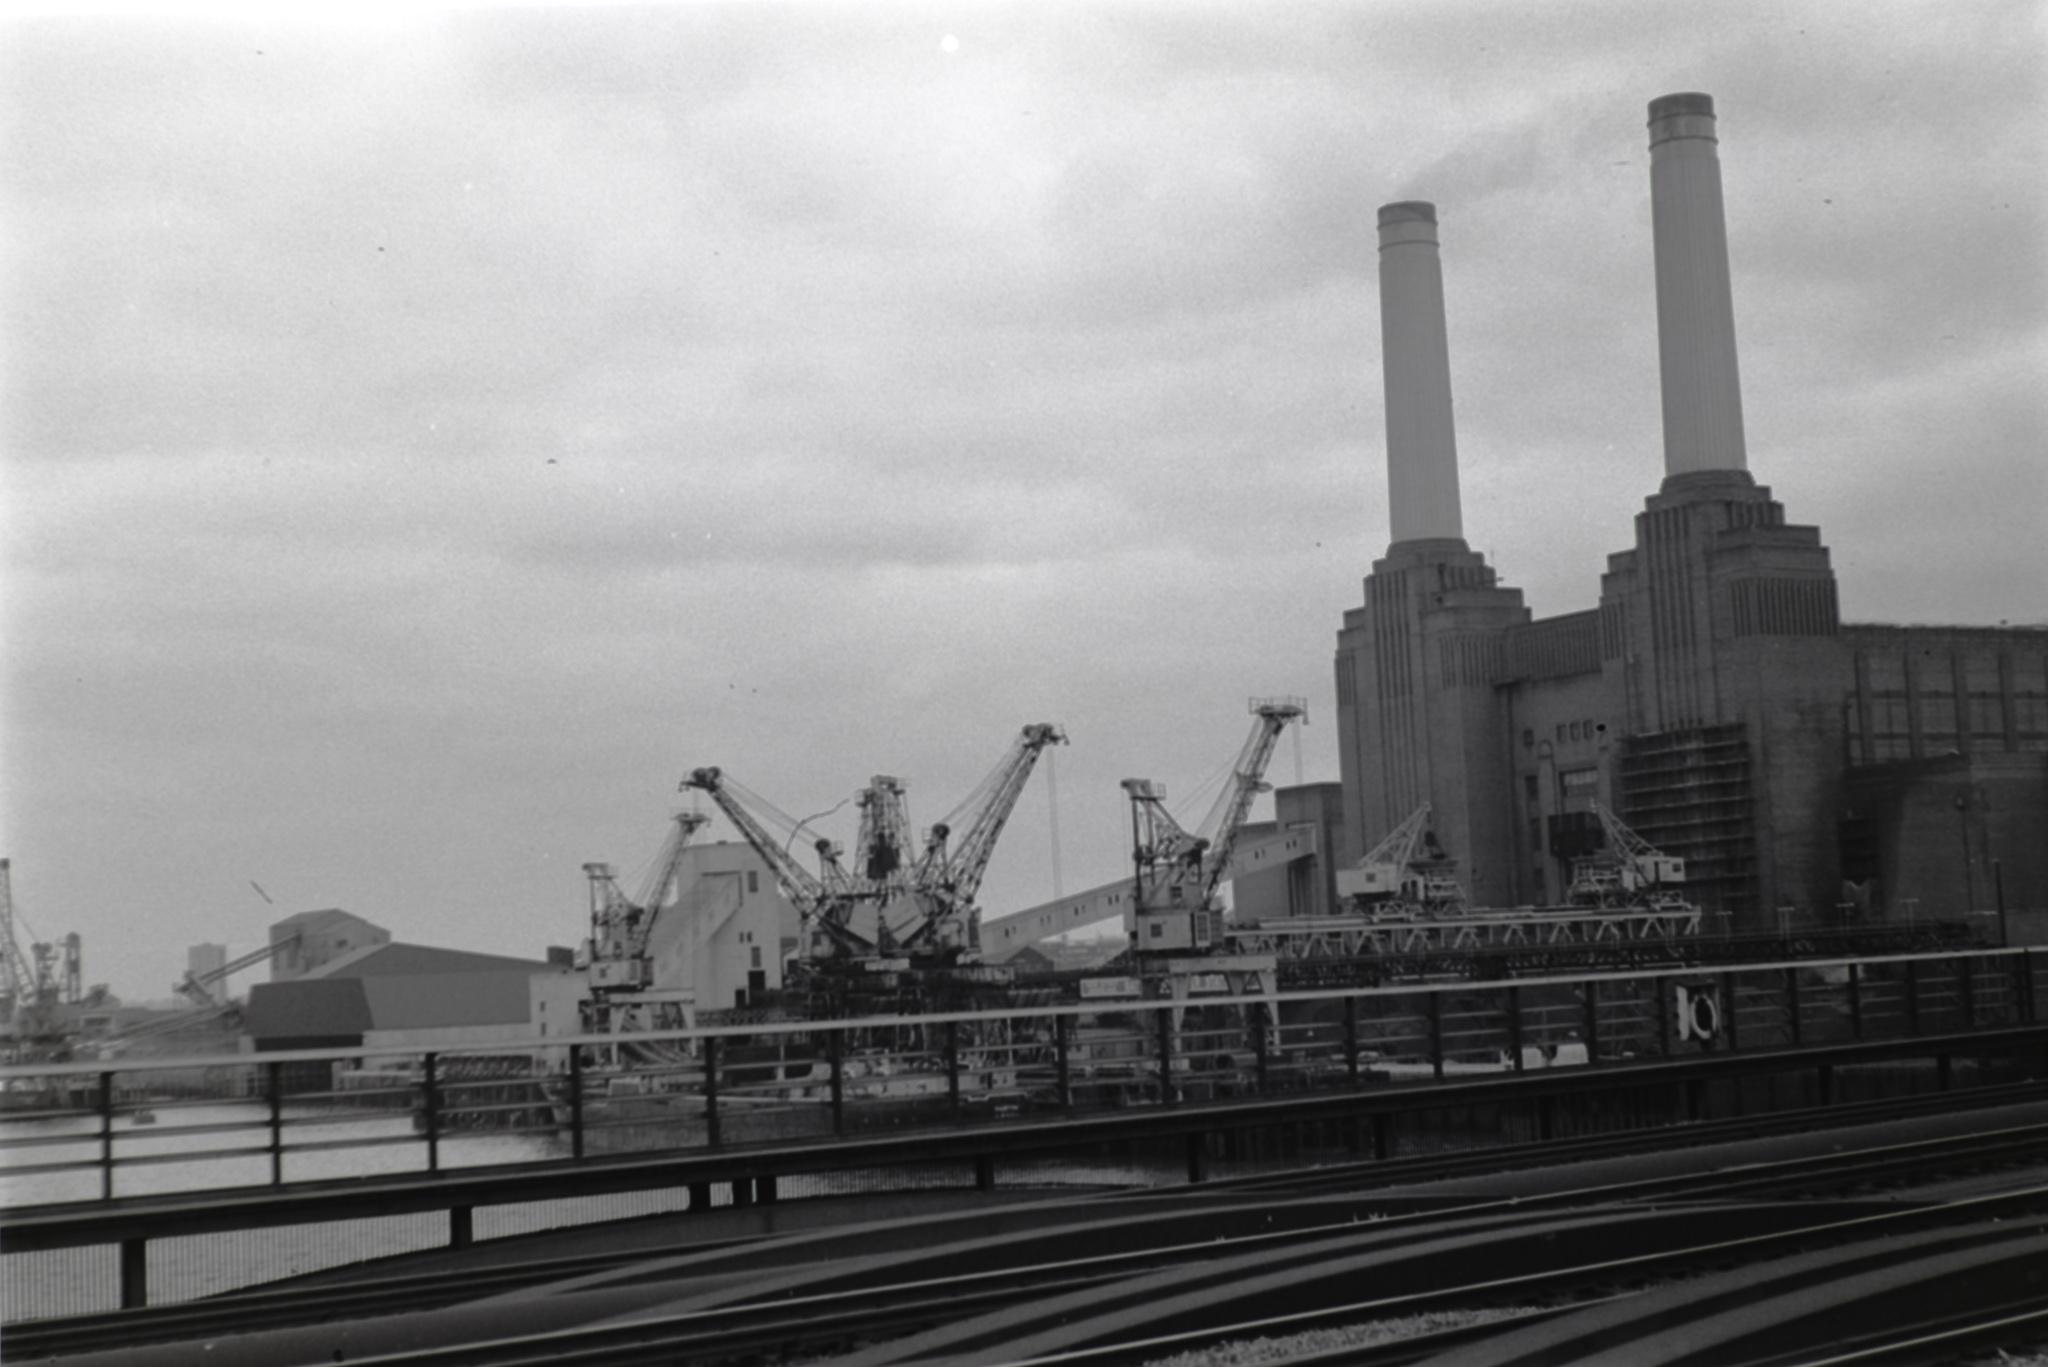 Battersea Power Station taken by Graham Land, April, 1973 (Digital scan)